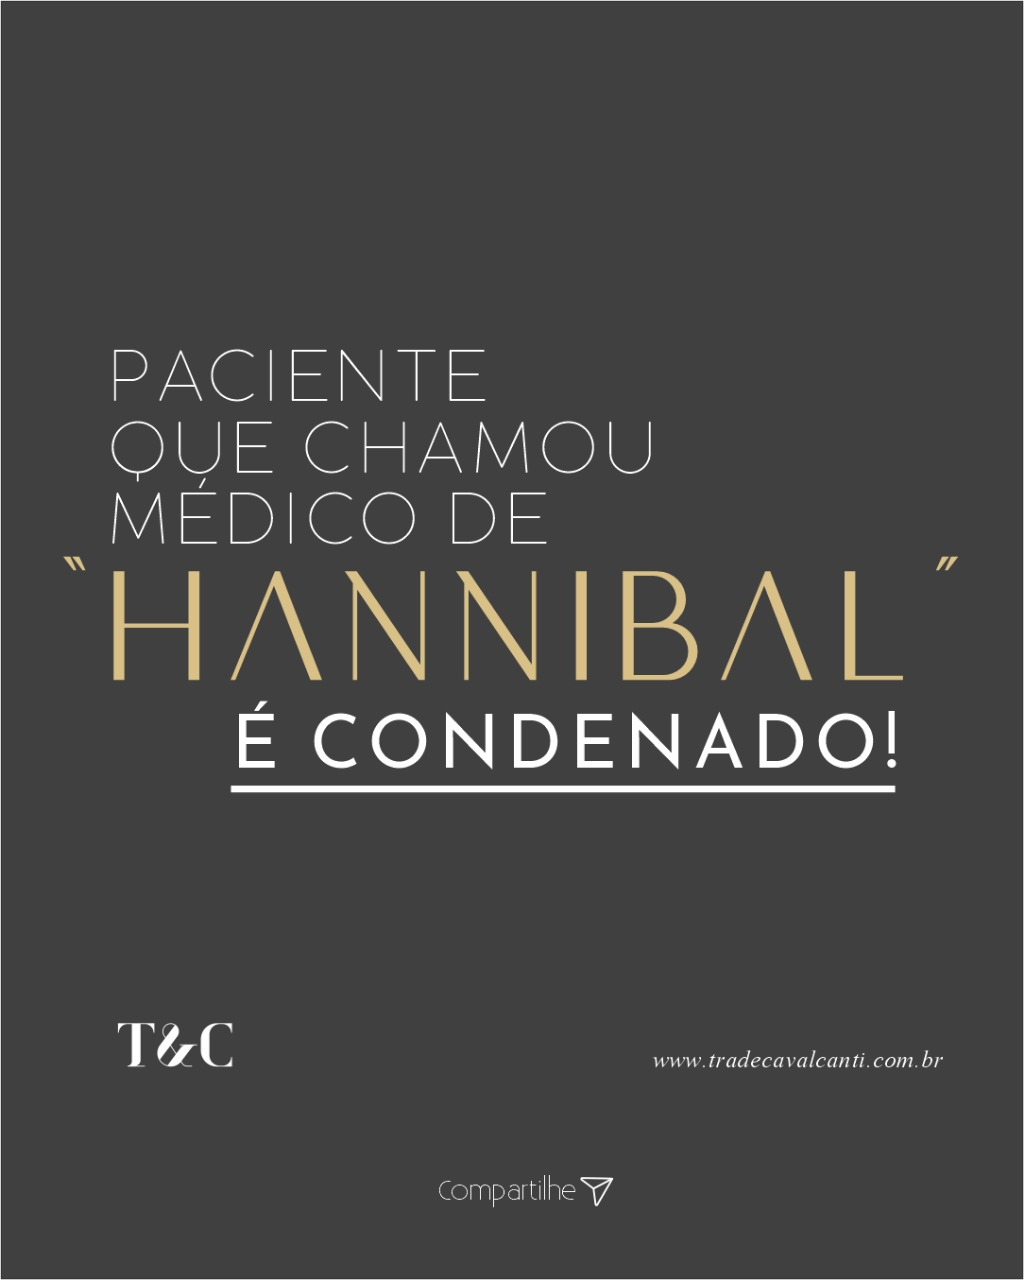 "PACIENTE QUE CHAMOU MÉDICO DE ""HANNIBAL"" É CONDENADO!"